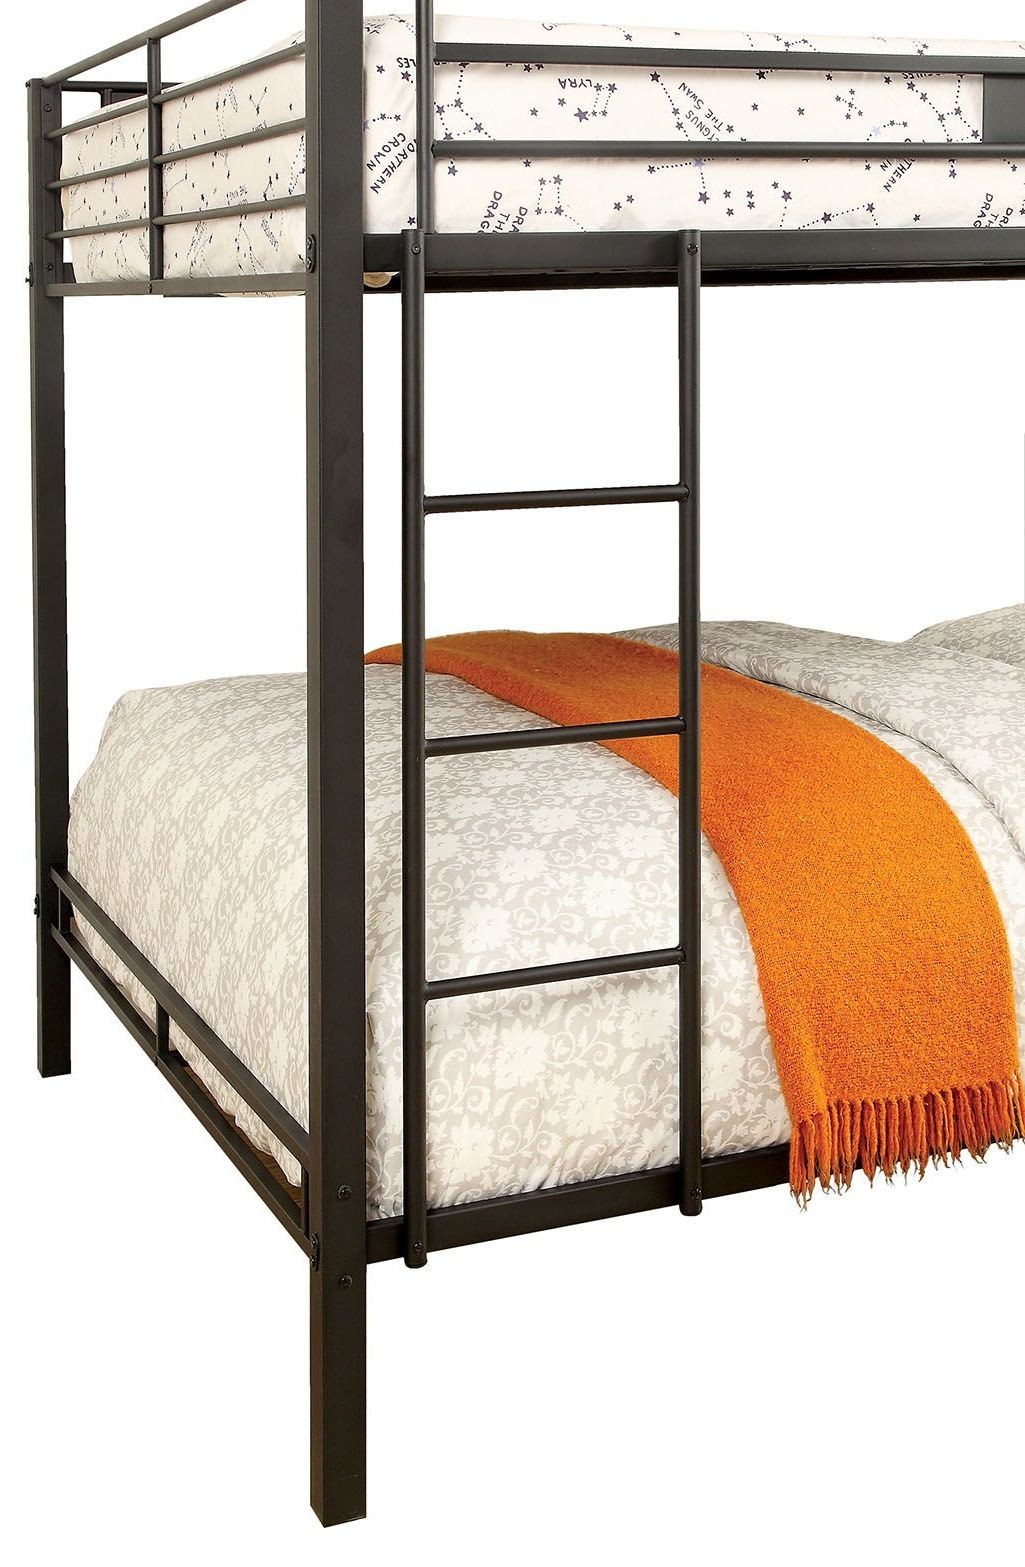 claren black queen over queen bunk bed from furniture of america coleman furniture. Black Bedroom Furniture Sets. Home Design Ideas